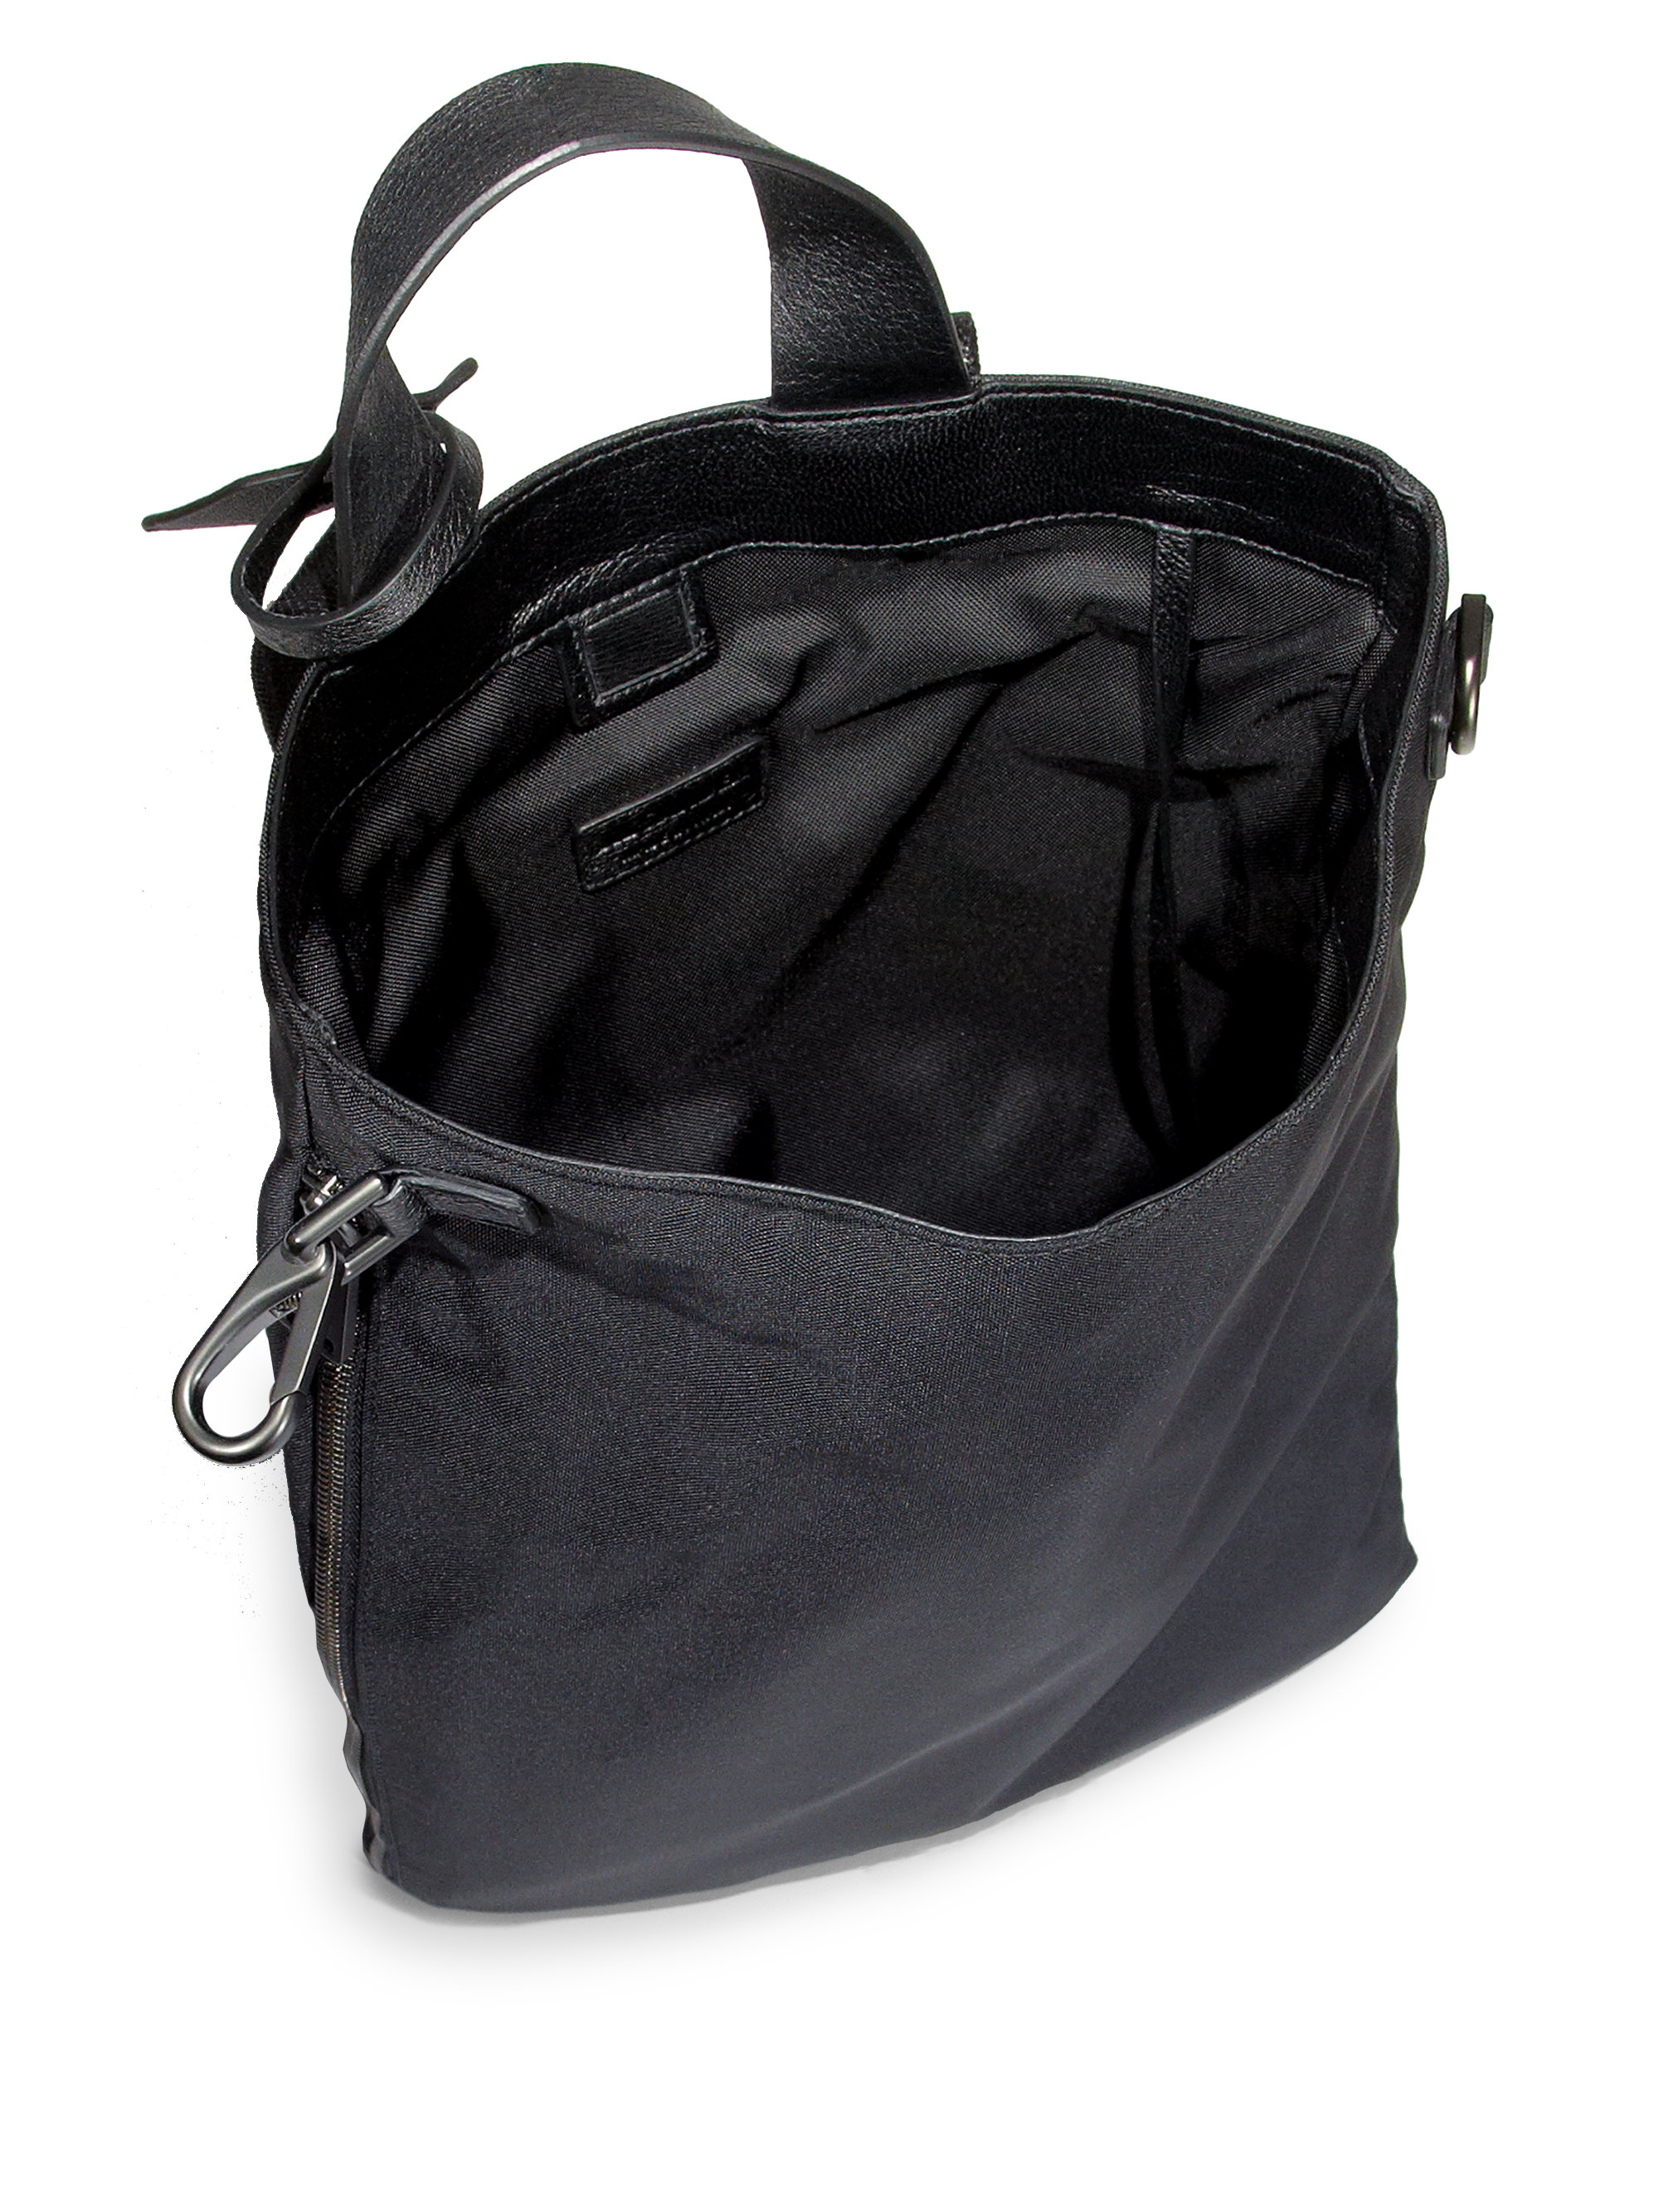 Lyst - Jil Sander Nylon Backpack in Black